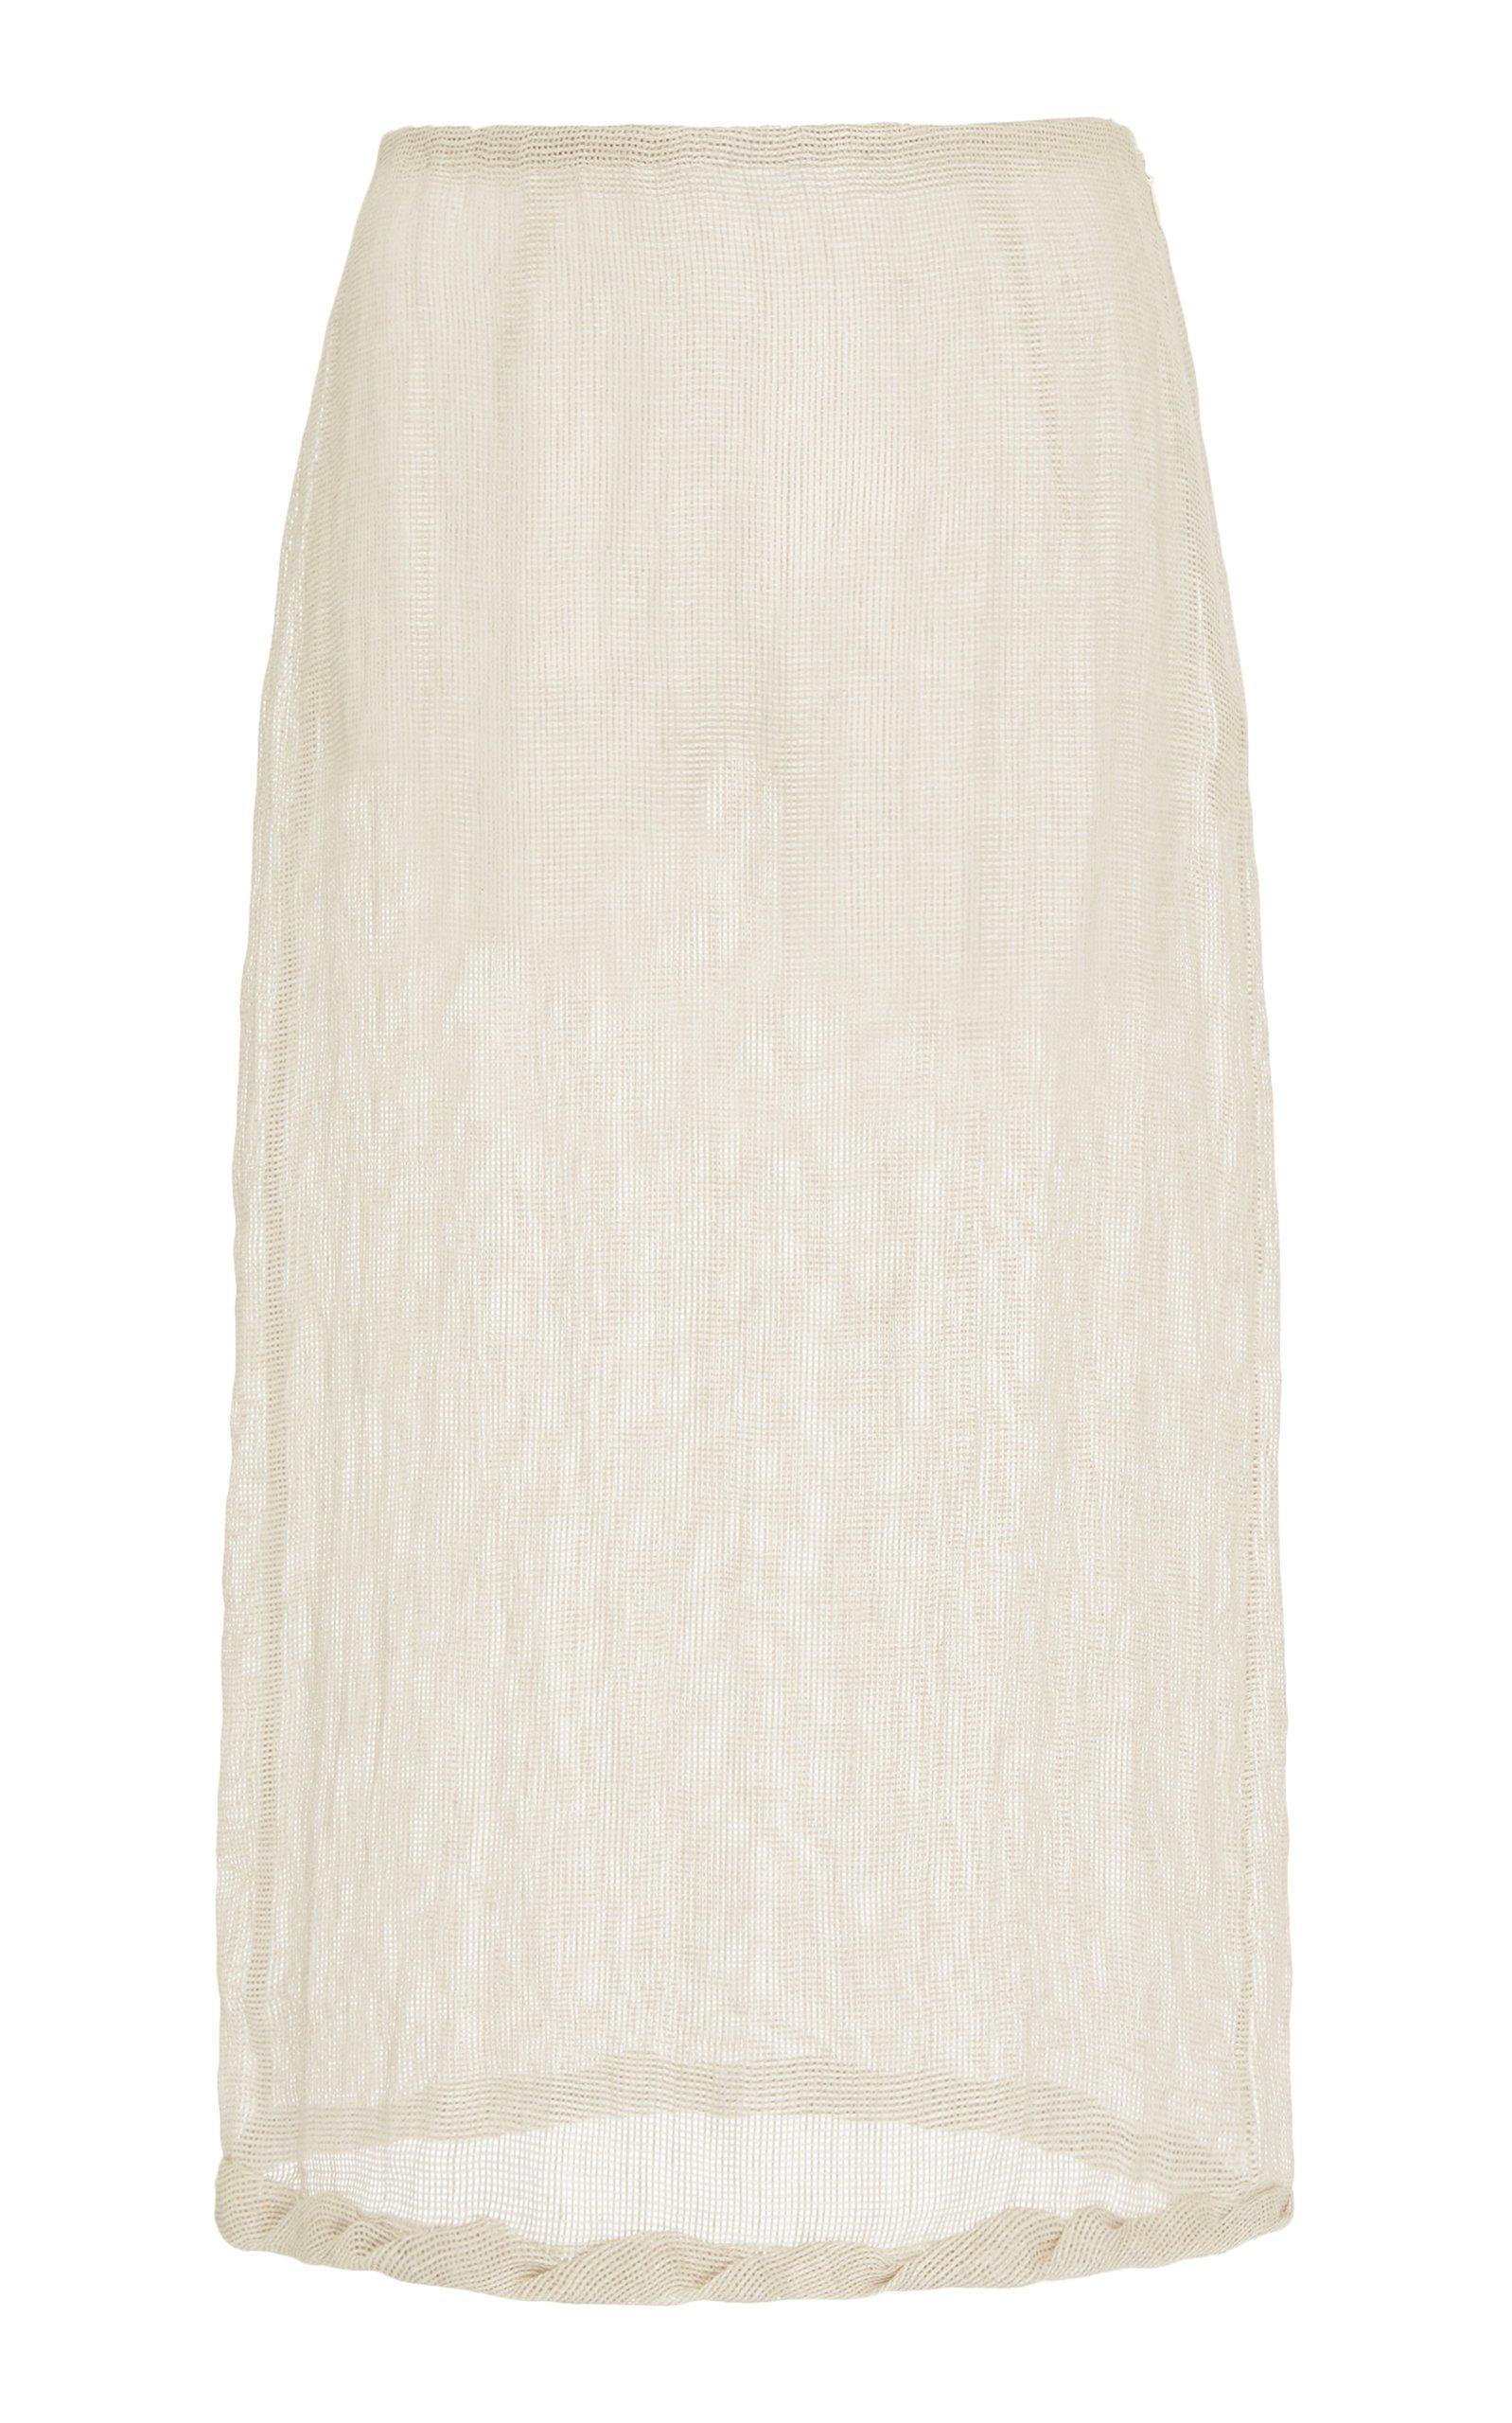 Rejina Pyo Dani Linen Voile Pencil Skirt Size: 6